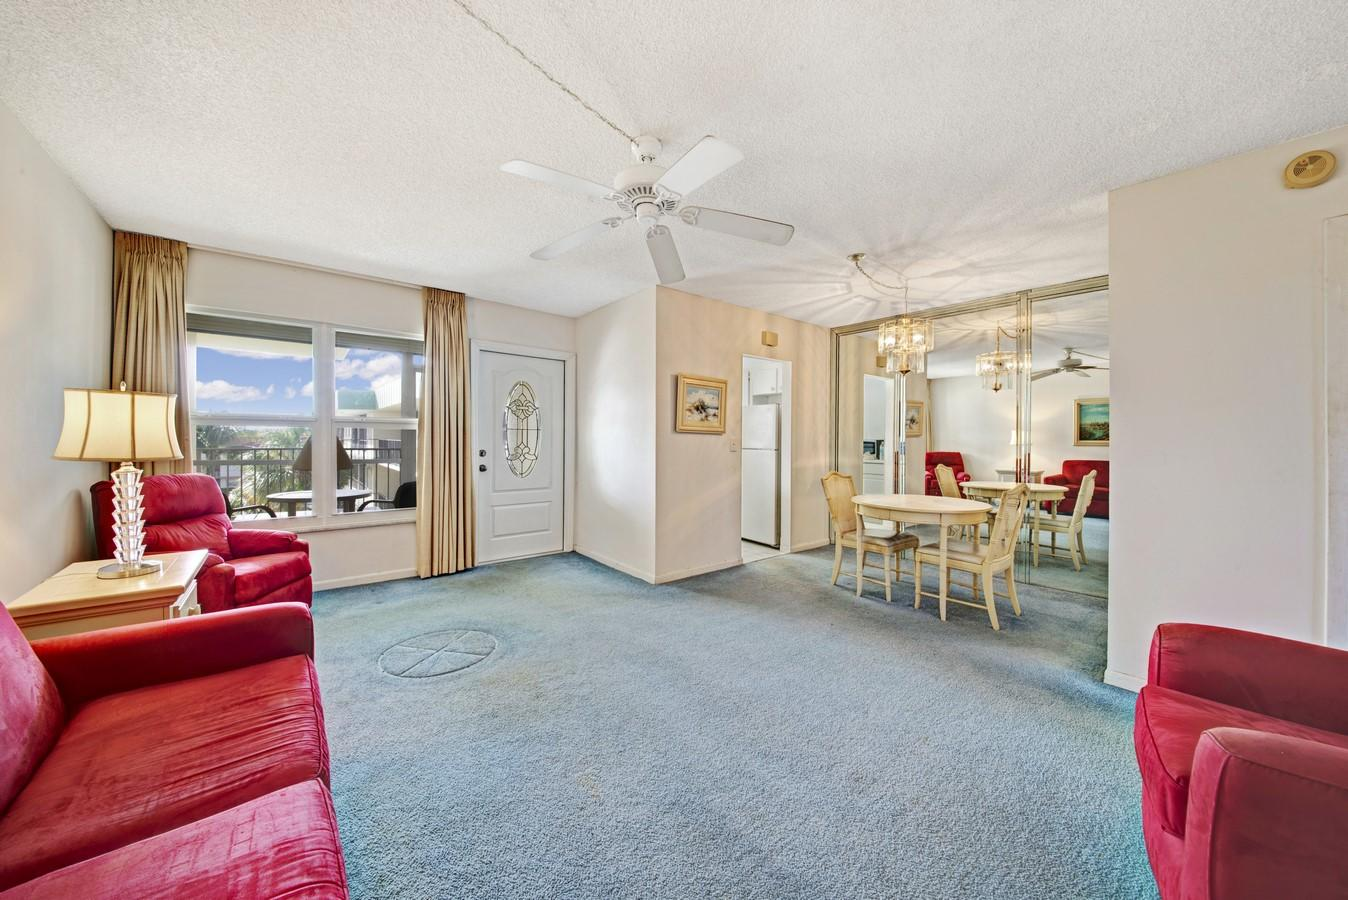 Home for sale in Hampton Gardens Deerfield Beach Florida